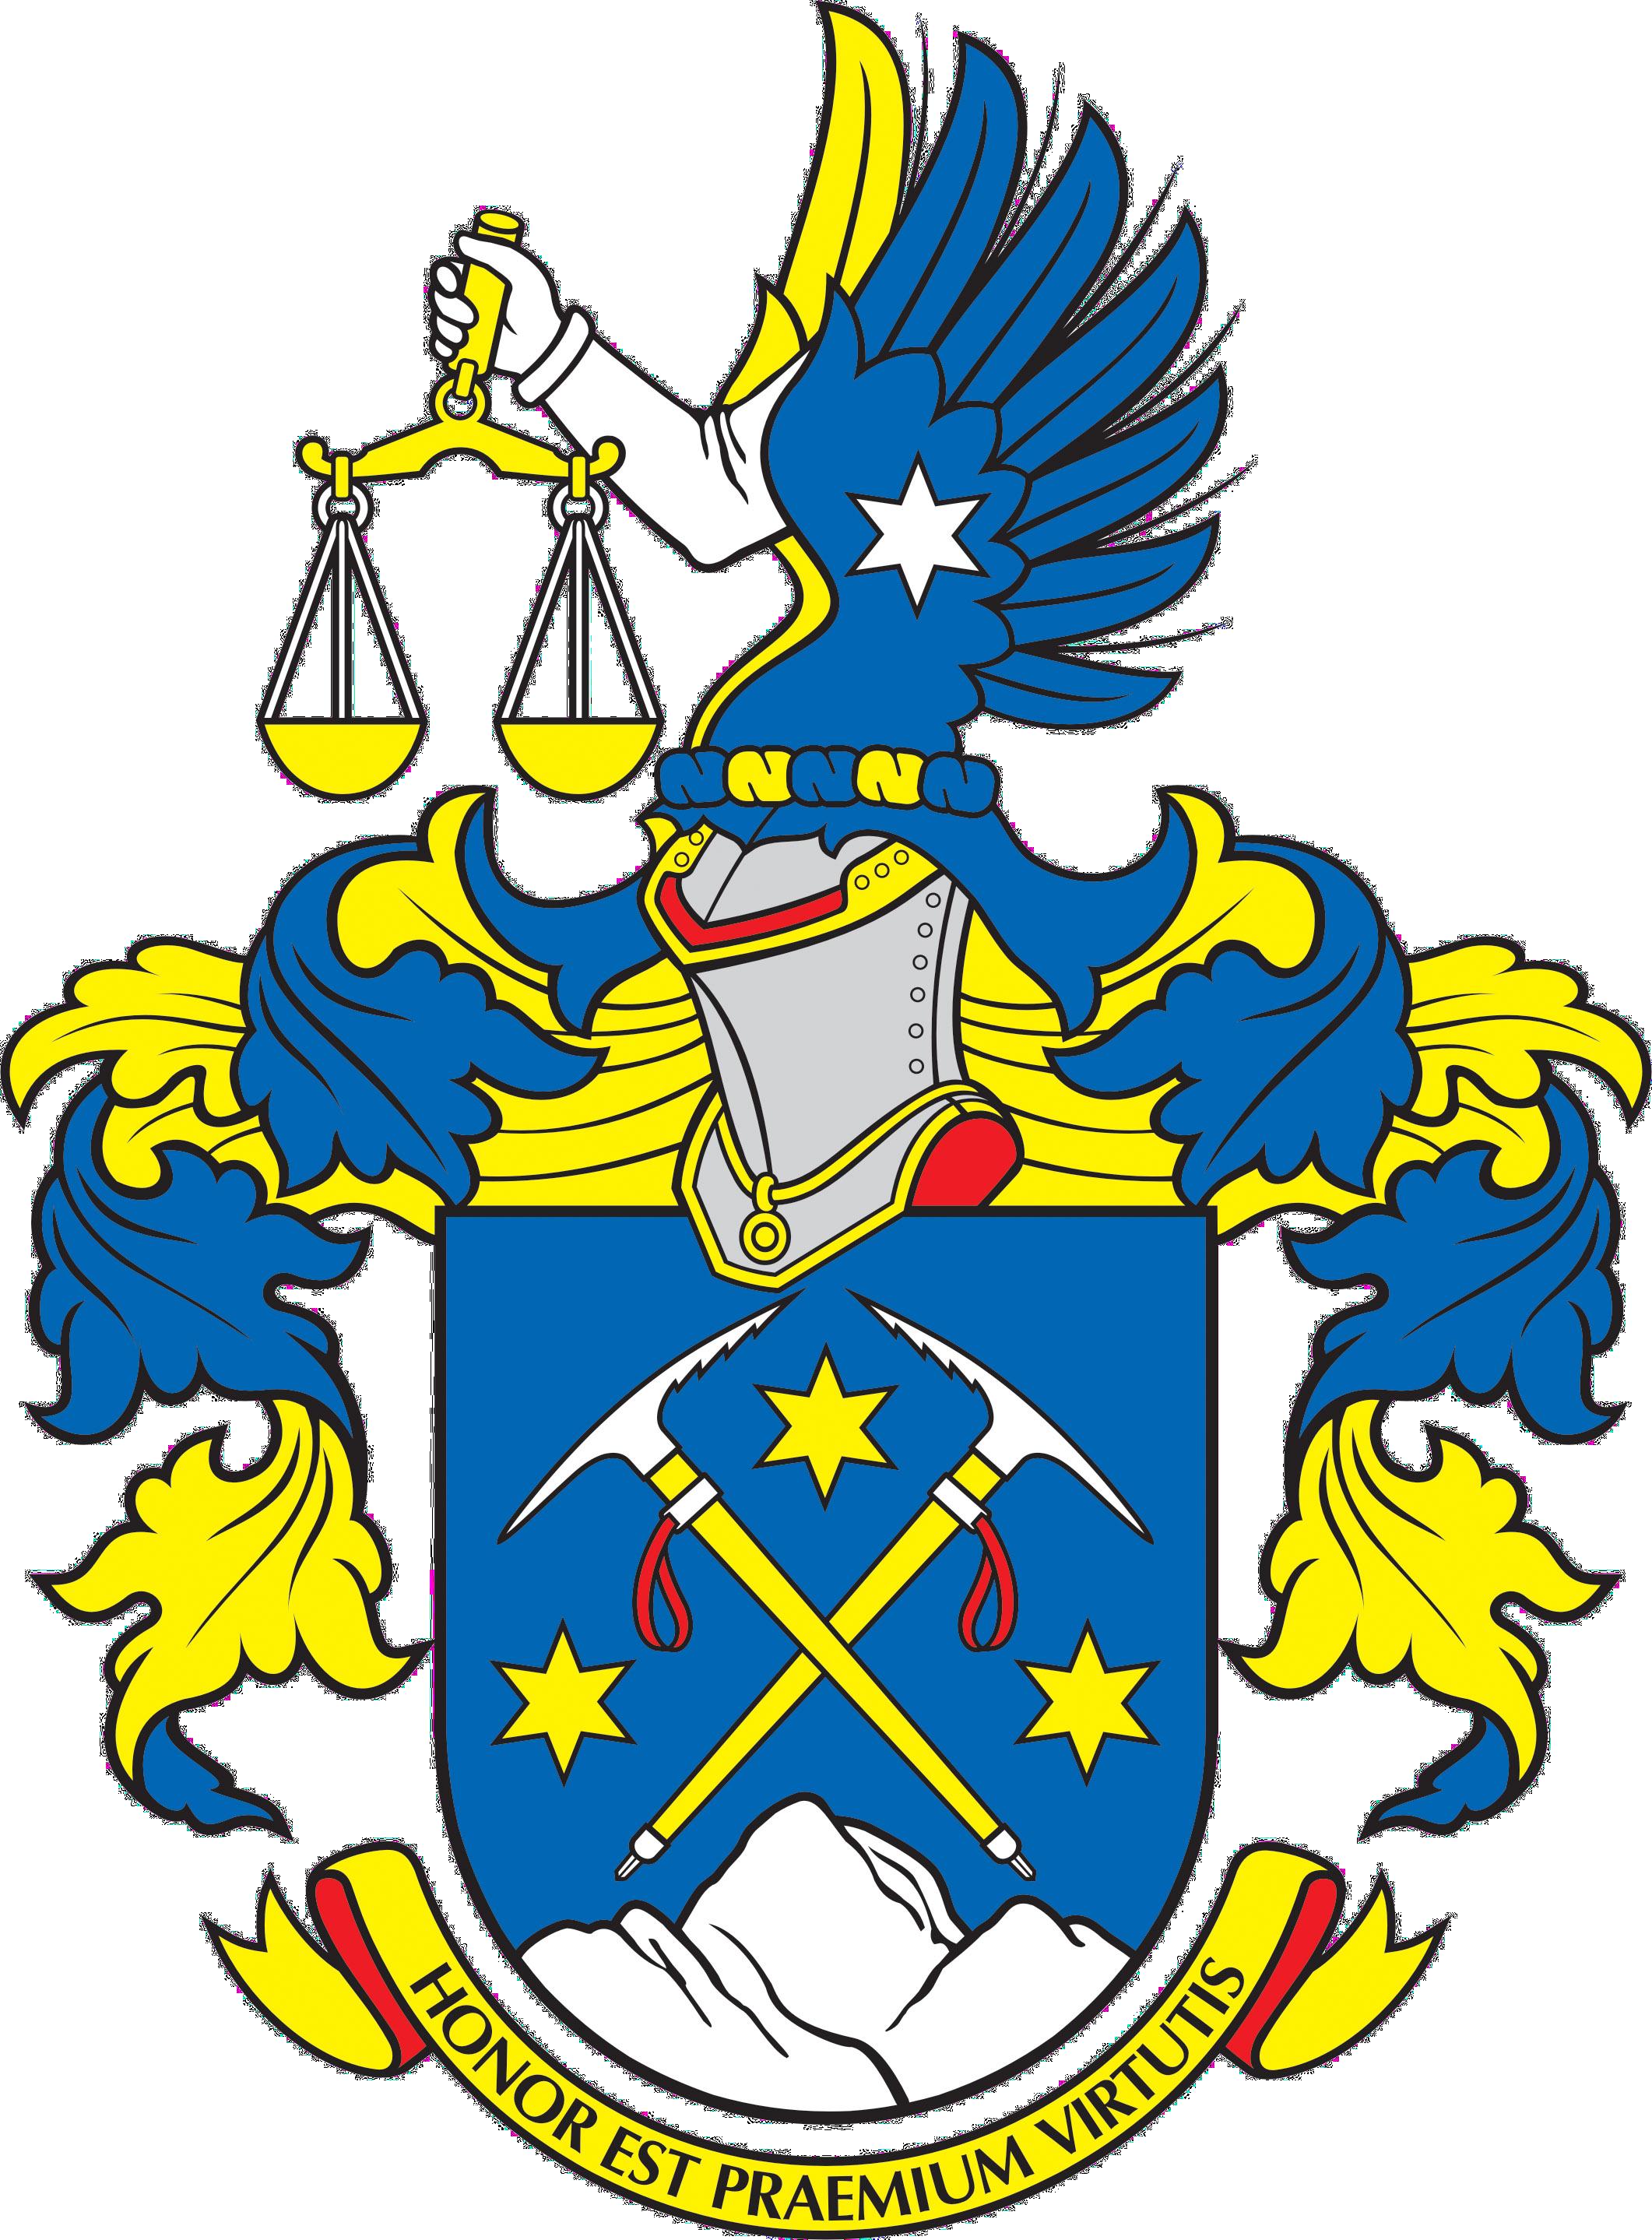 JANIGA PHOS GRAPHEIN, s.r.o. logo